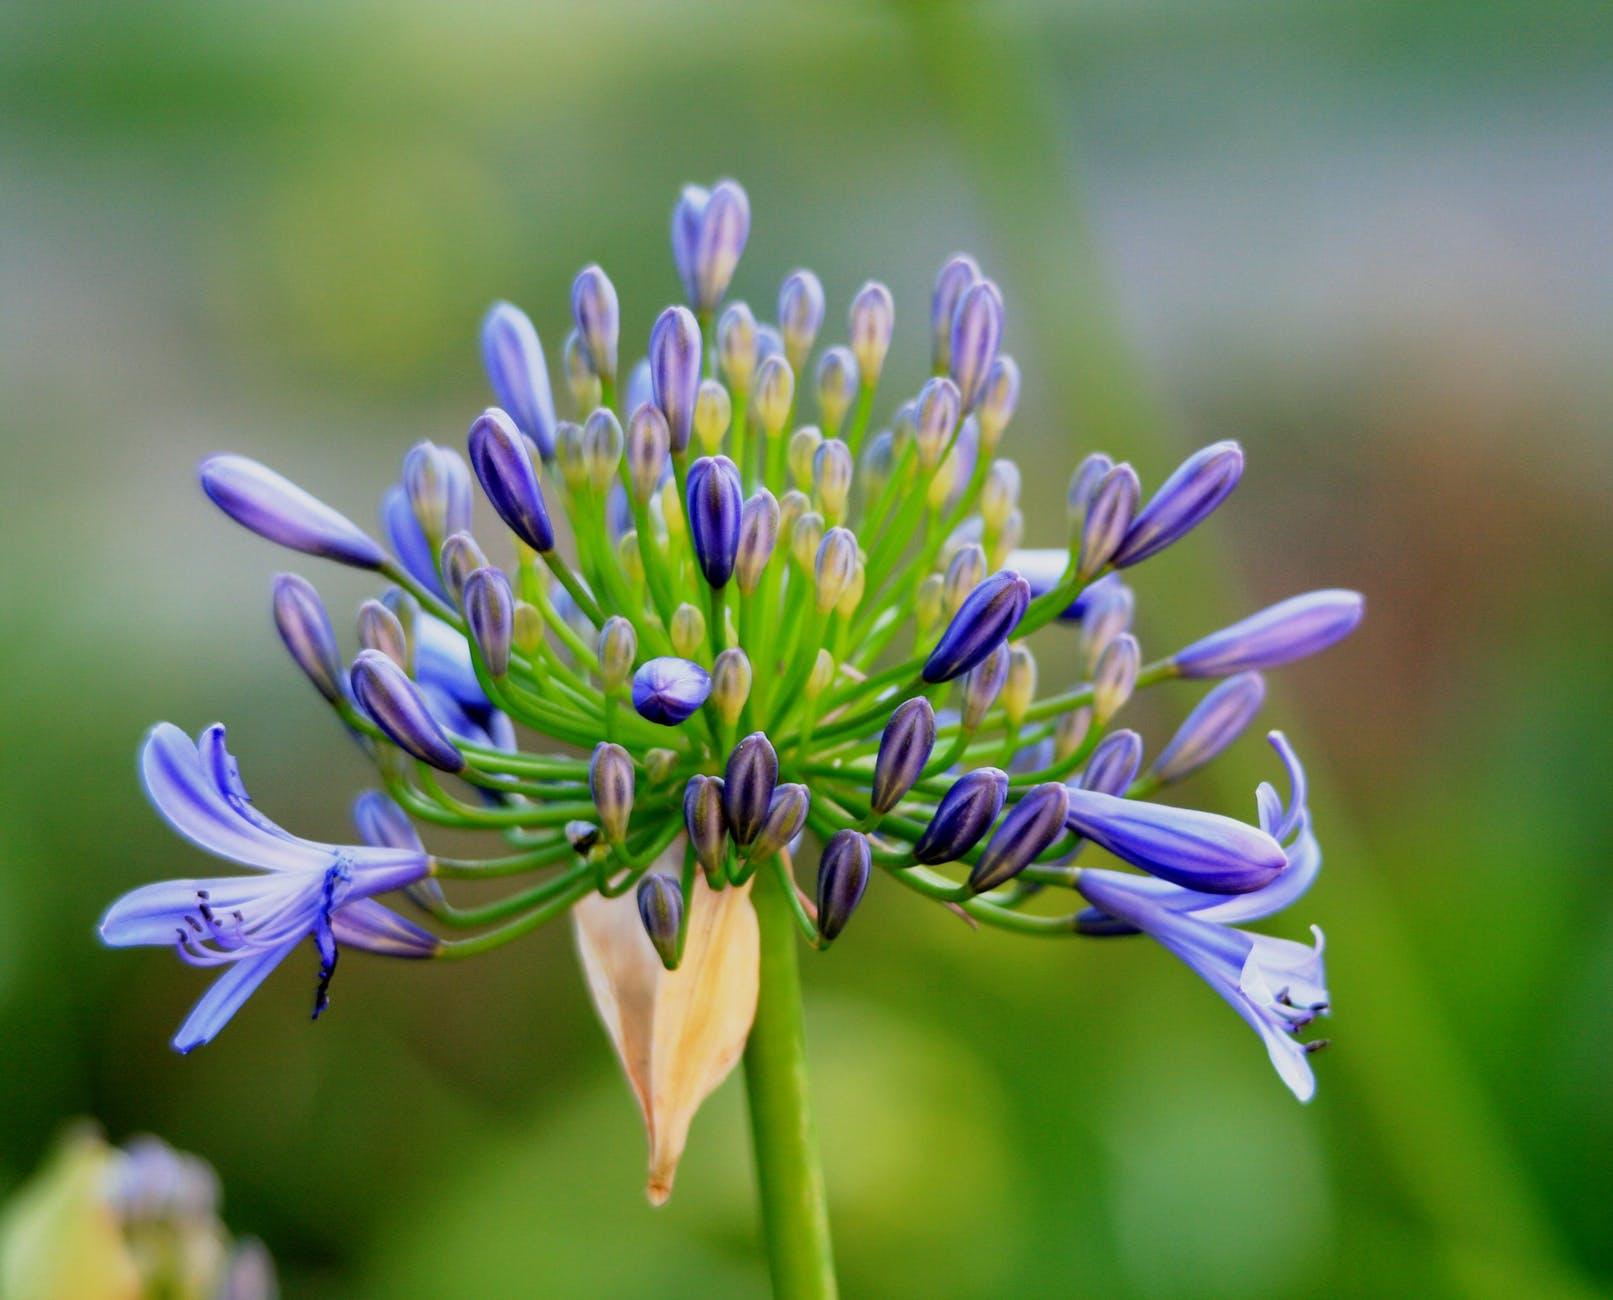 agapanthus-flower-florets-buds-62292.jpeg